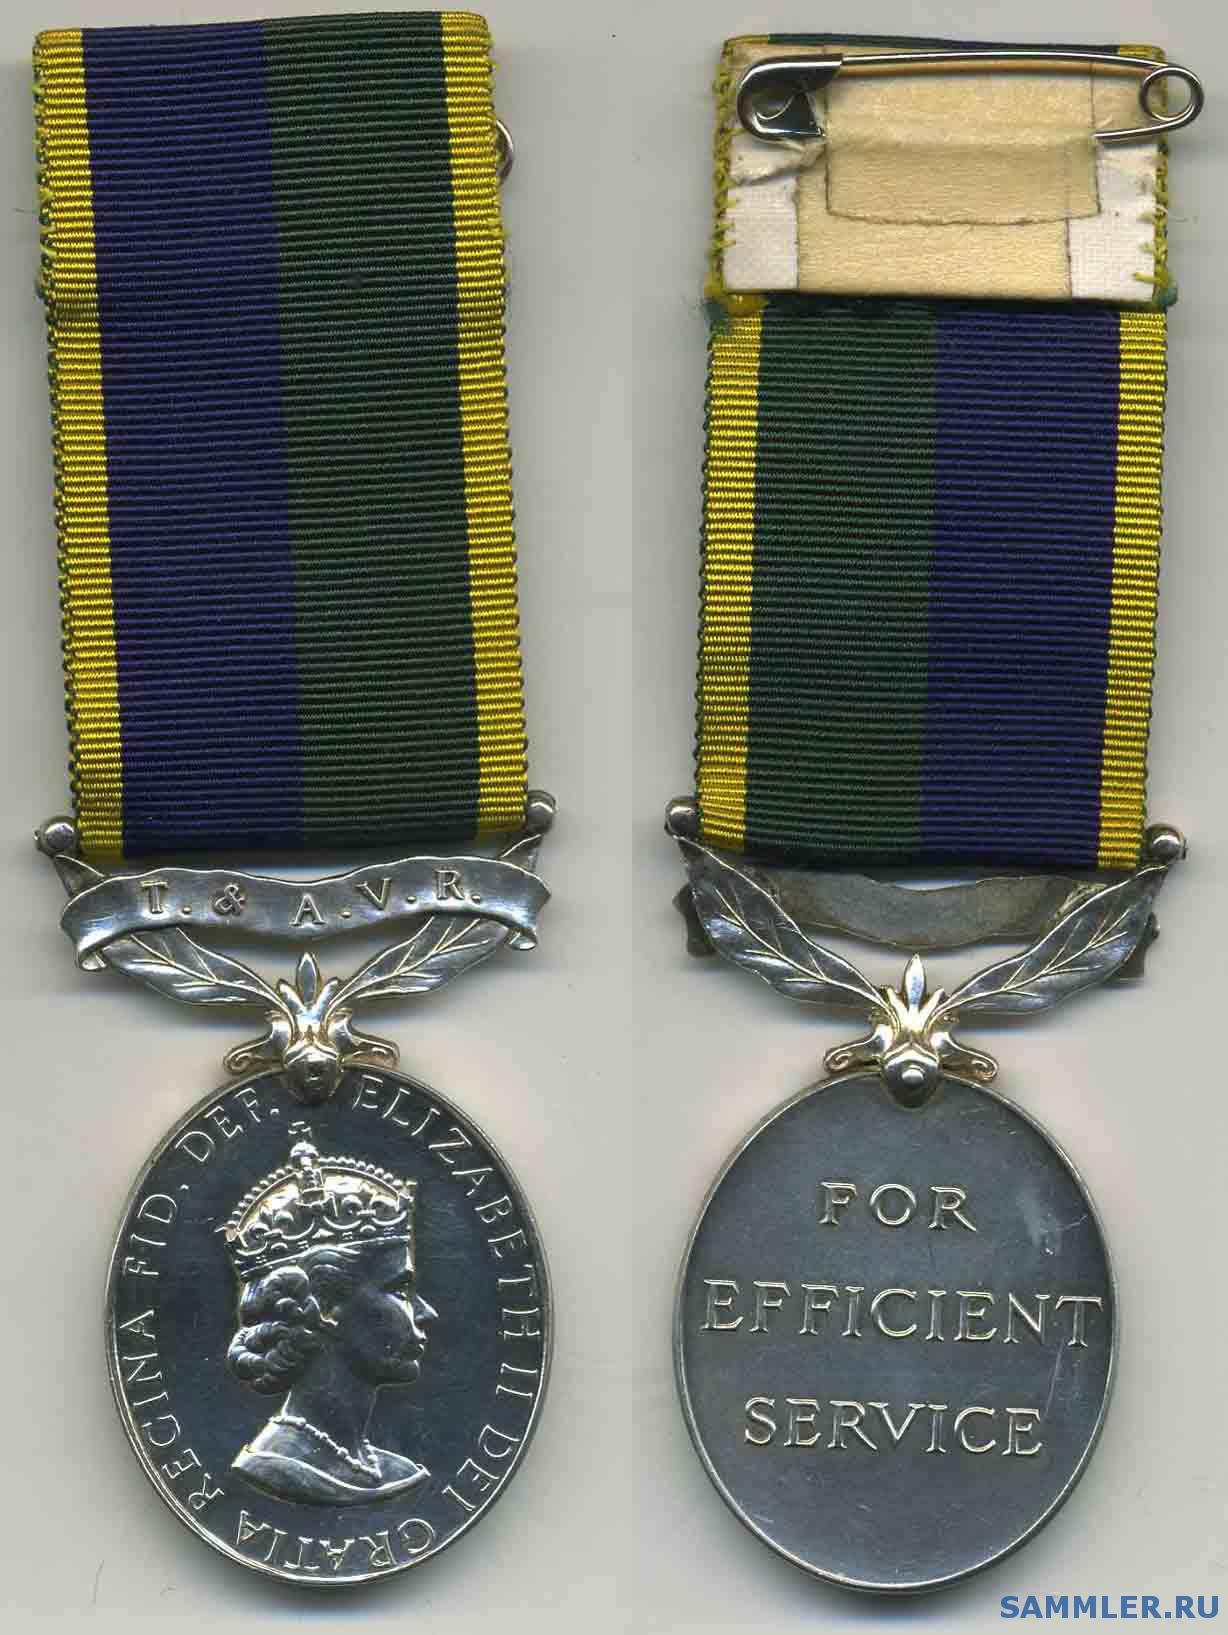 Efficiency_Medal_T._A.V.R._E_II_.jpg